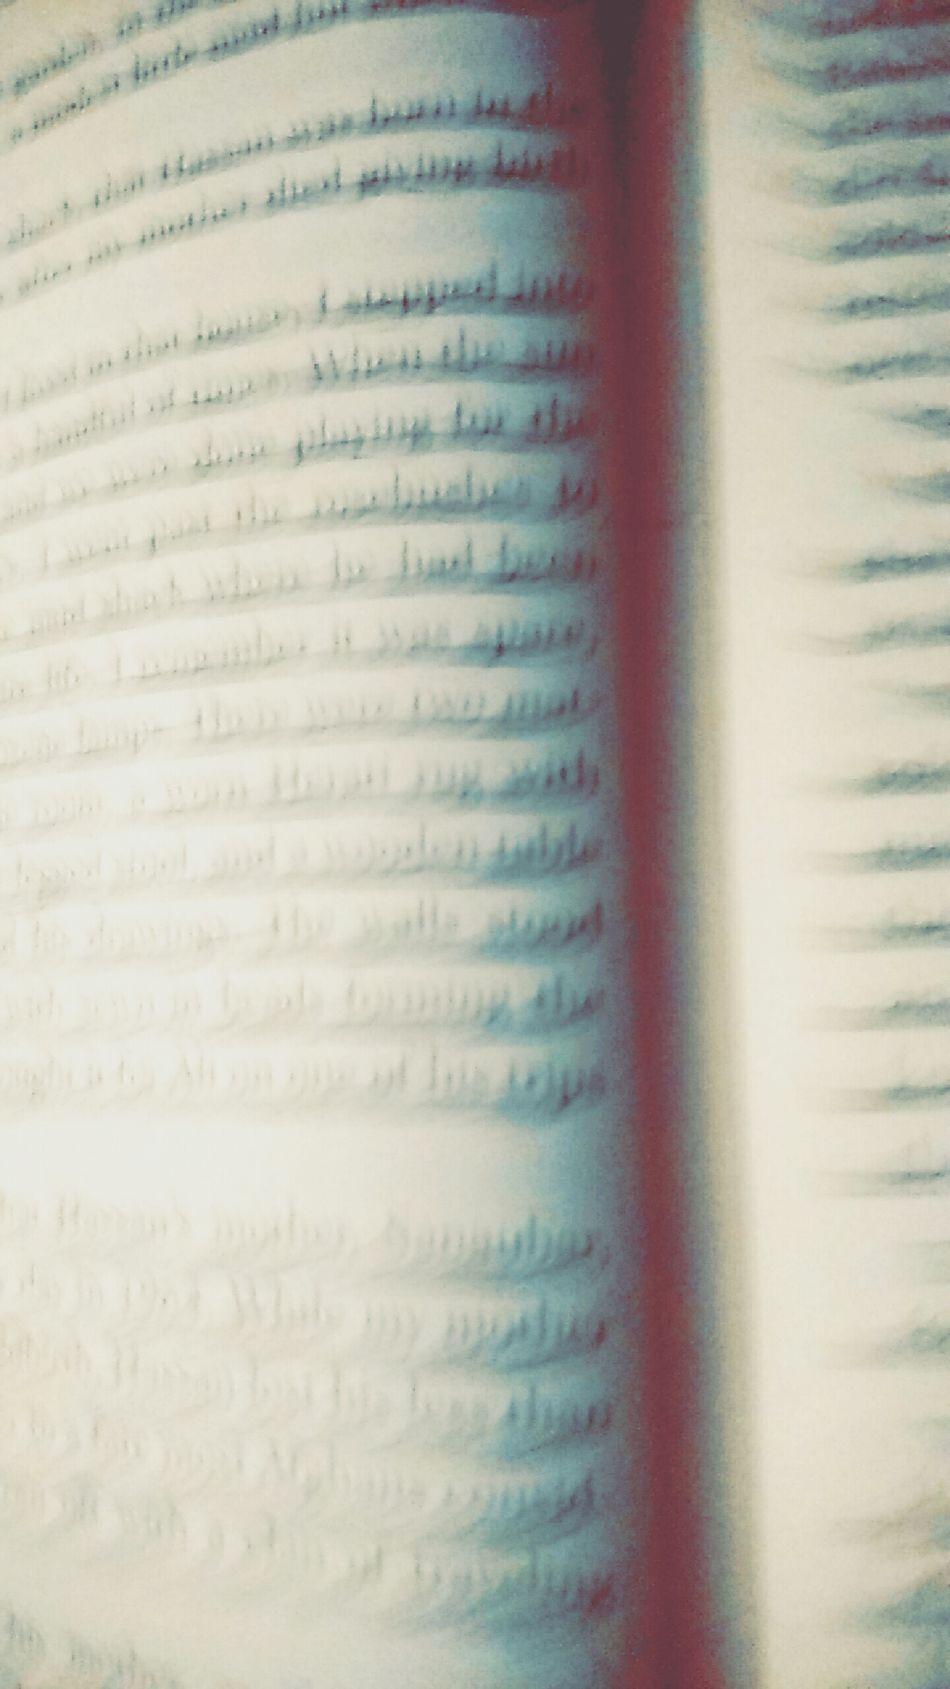 Book Reading Blur Text The Kite Runner